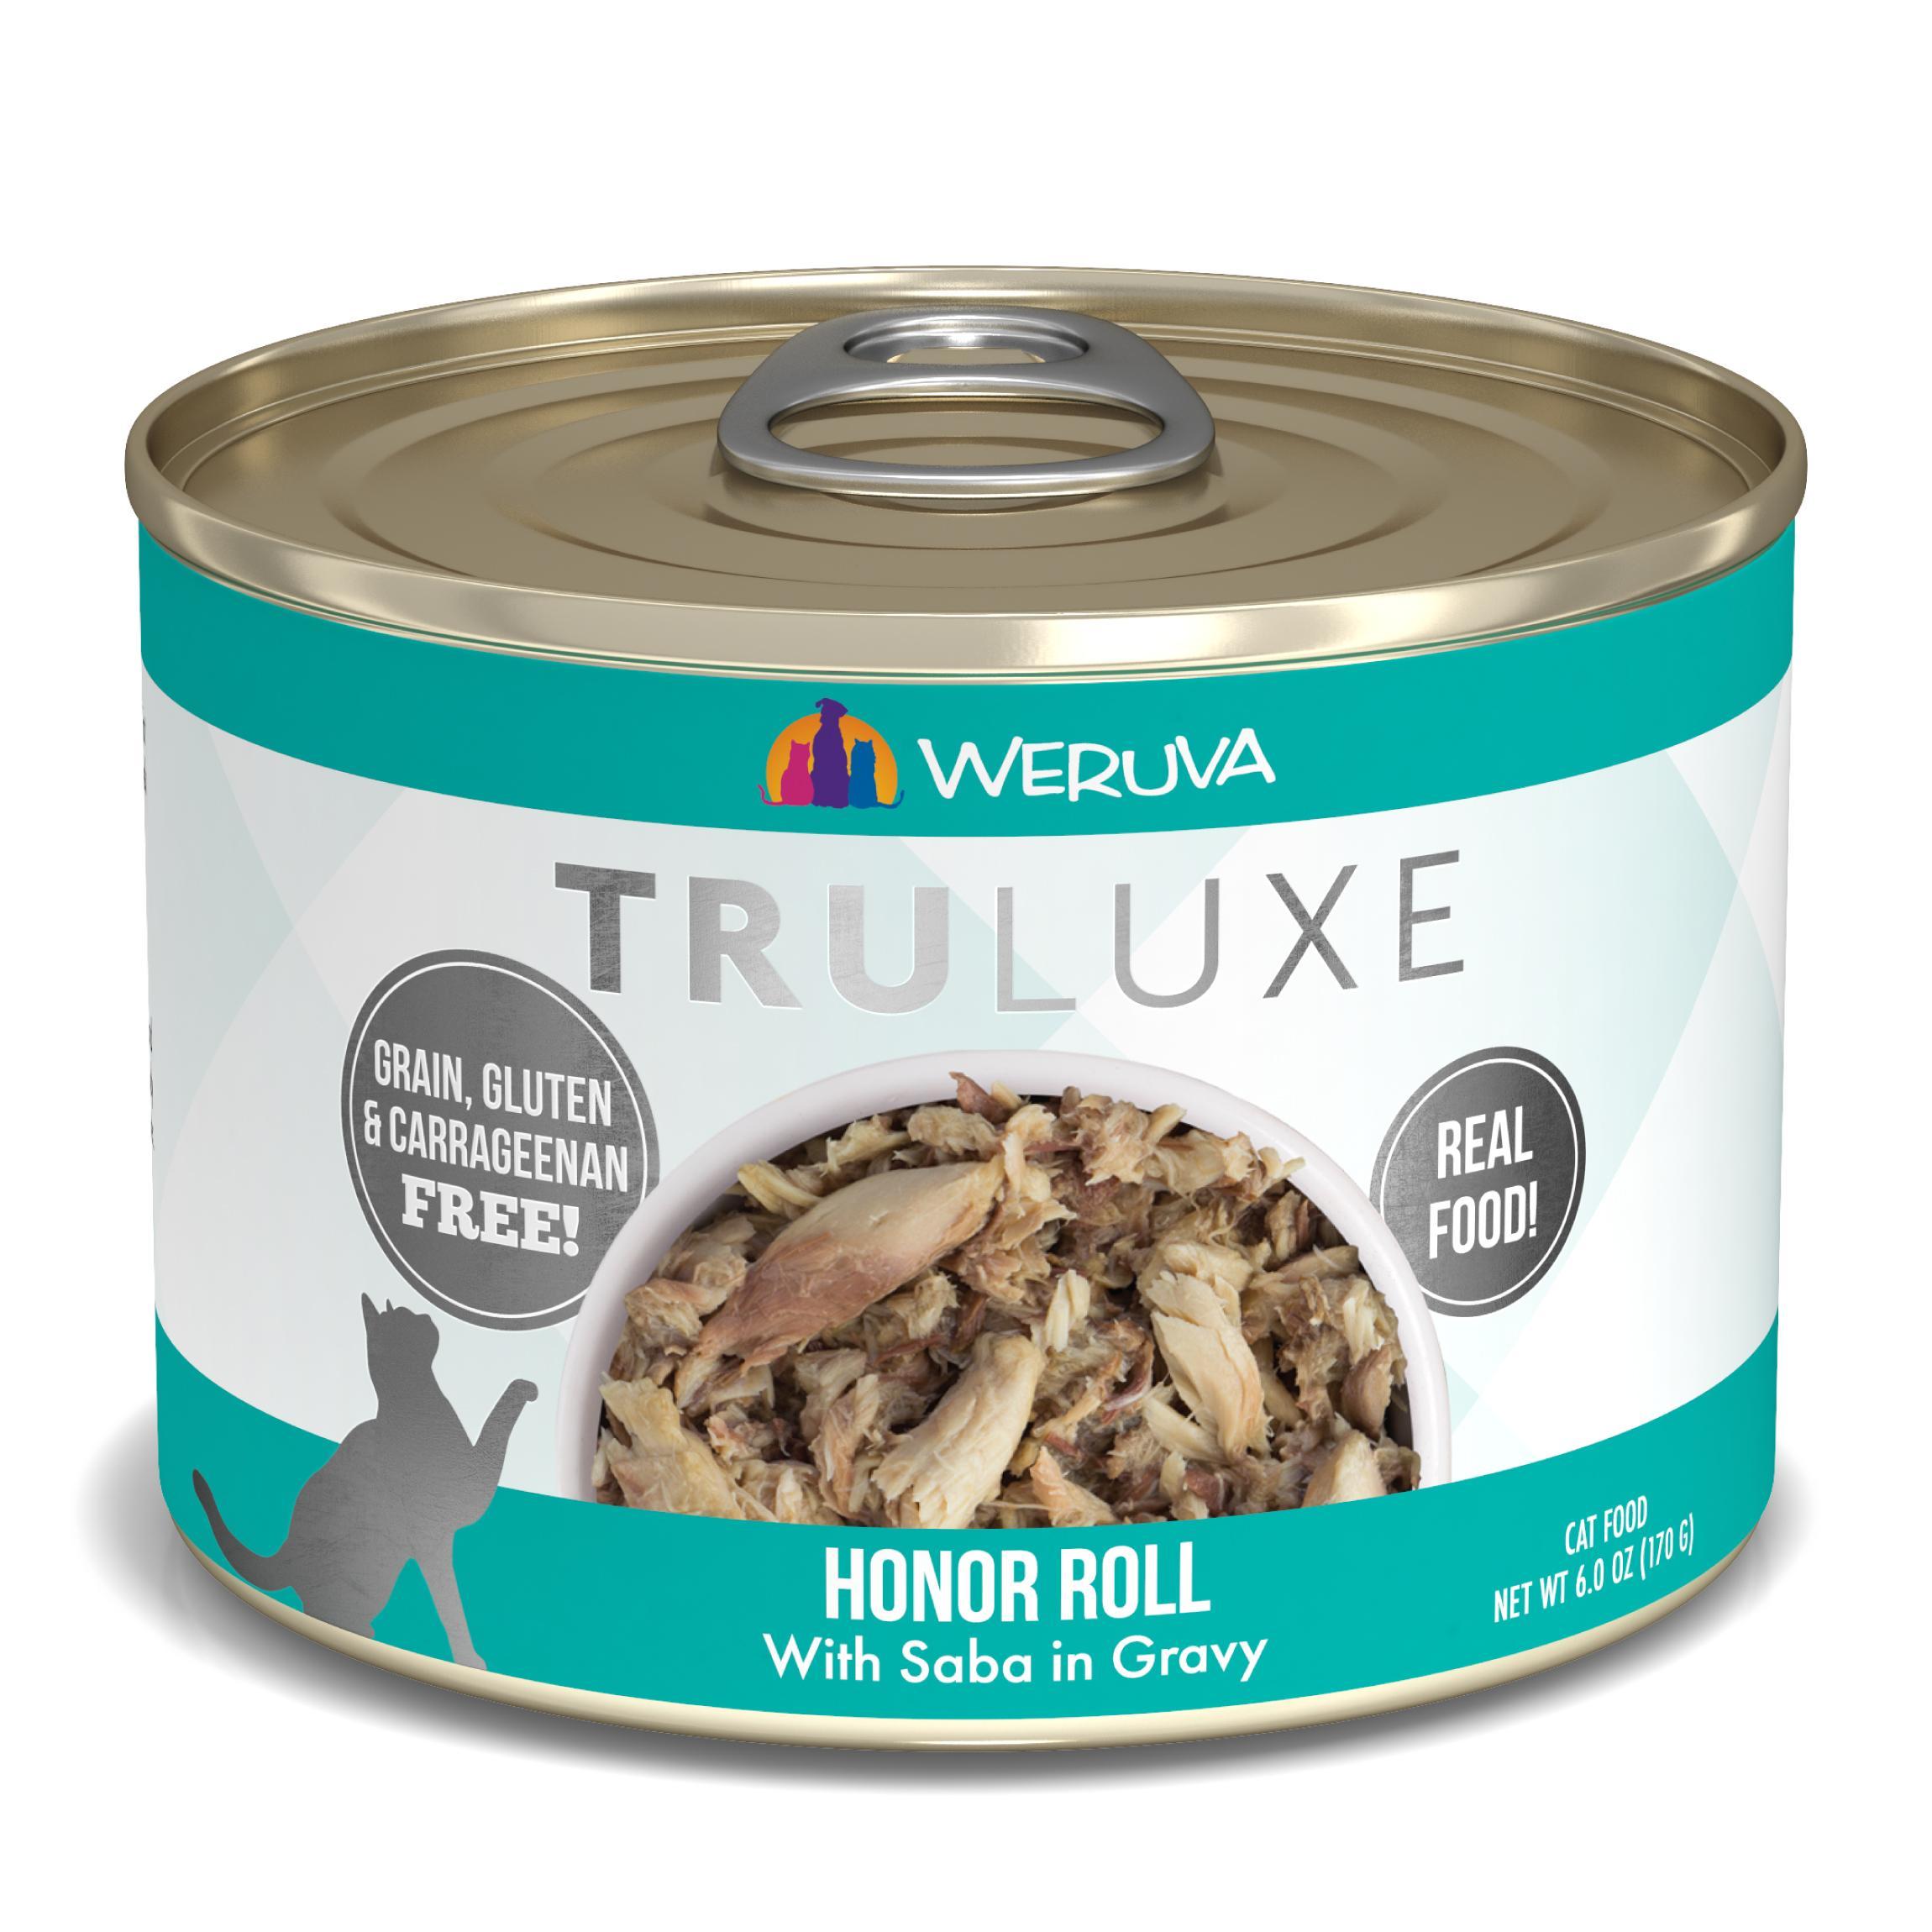 Weruva Cat Truluxe Honor Roll with Saba in Gravy Grain-Free Wet Cat Food, 6-oz